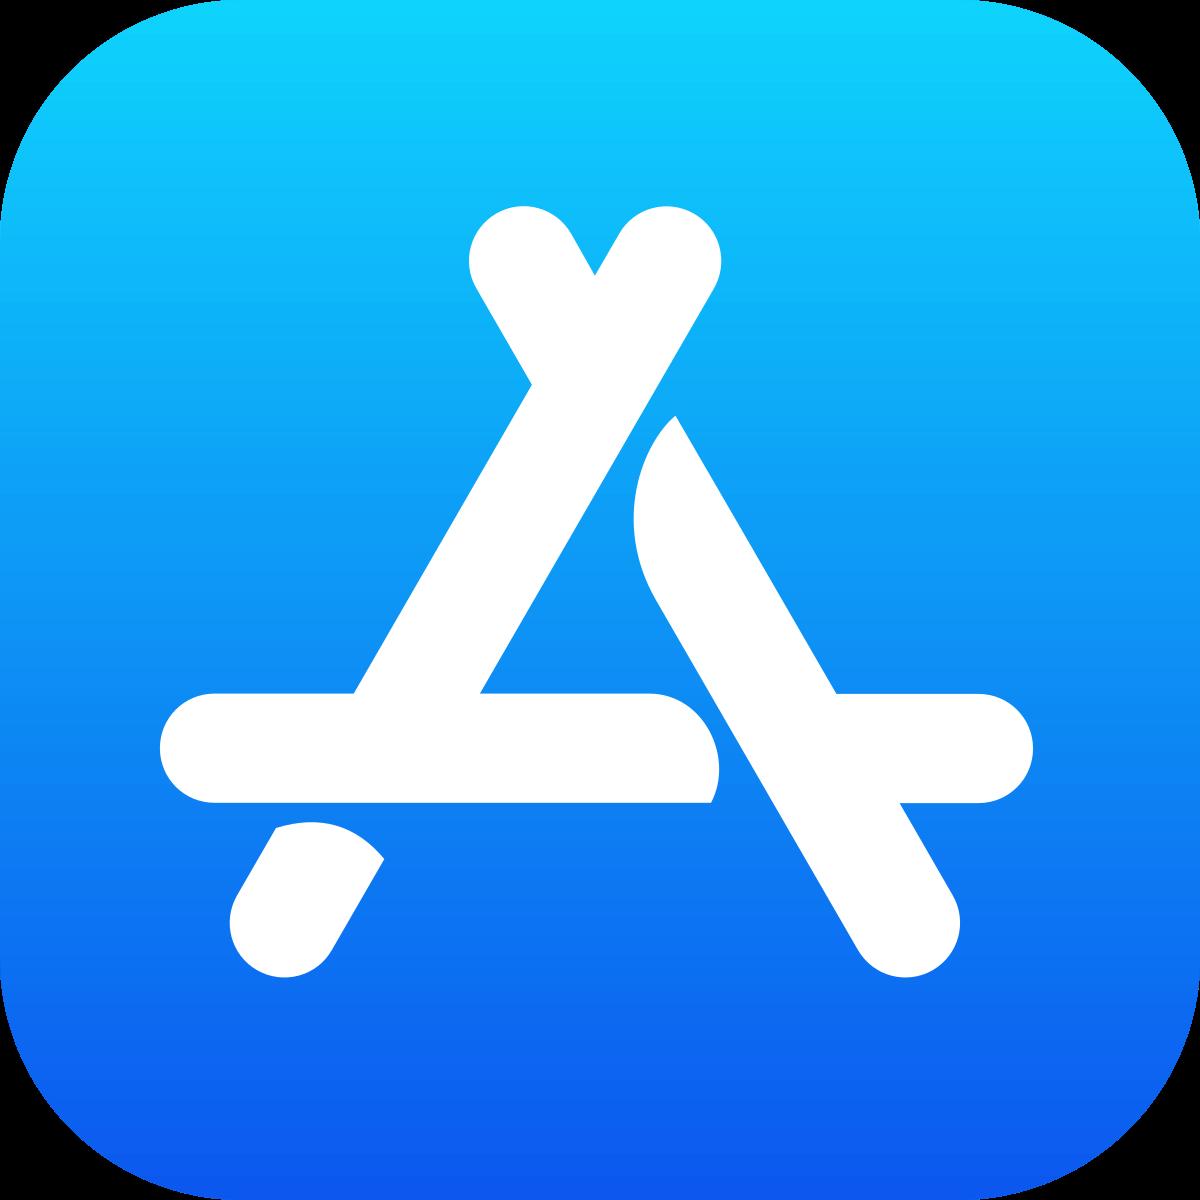 Logo obchodu s aplikacemi Appstore.